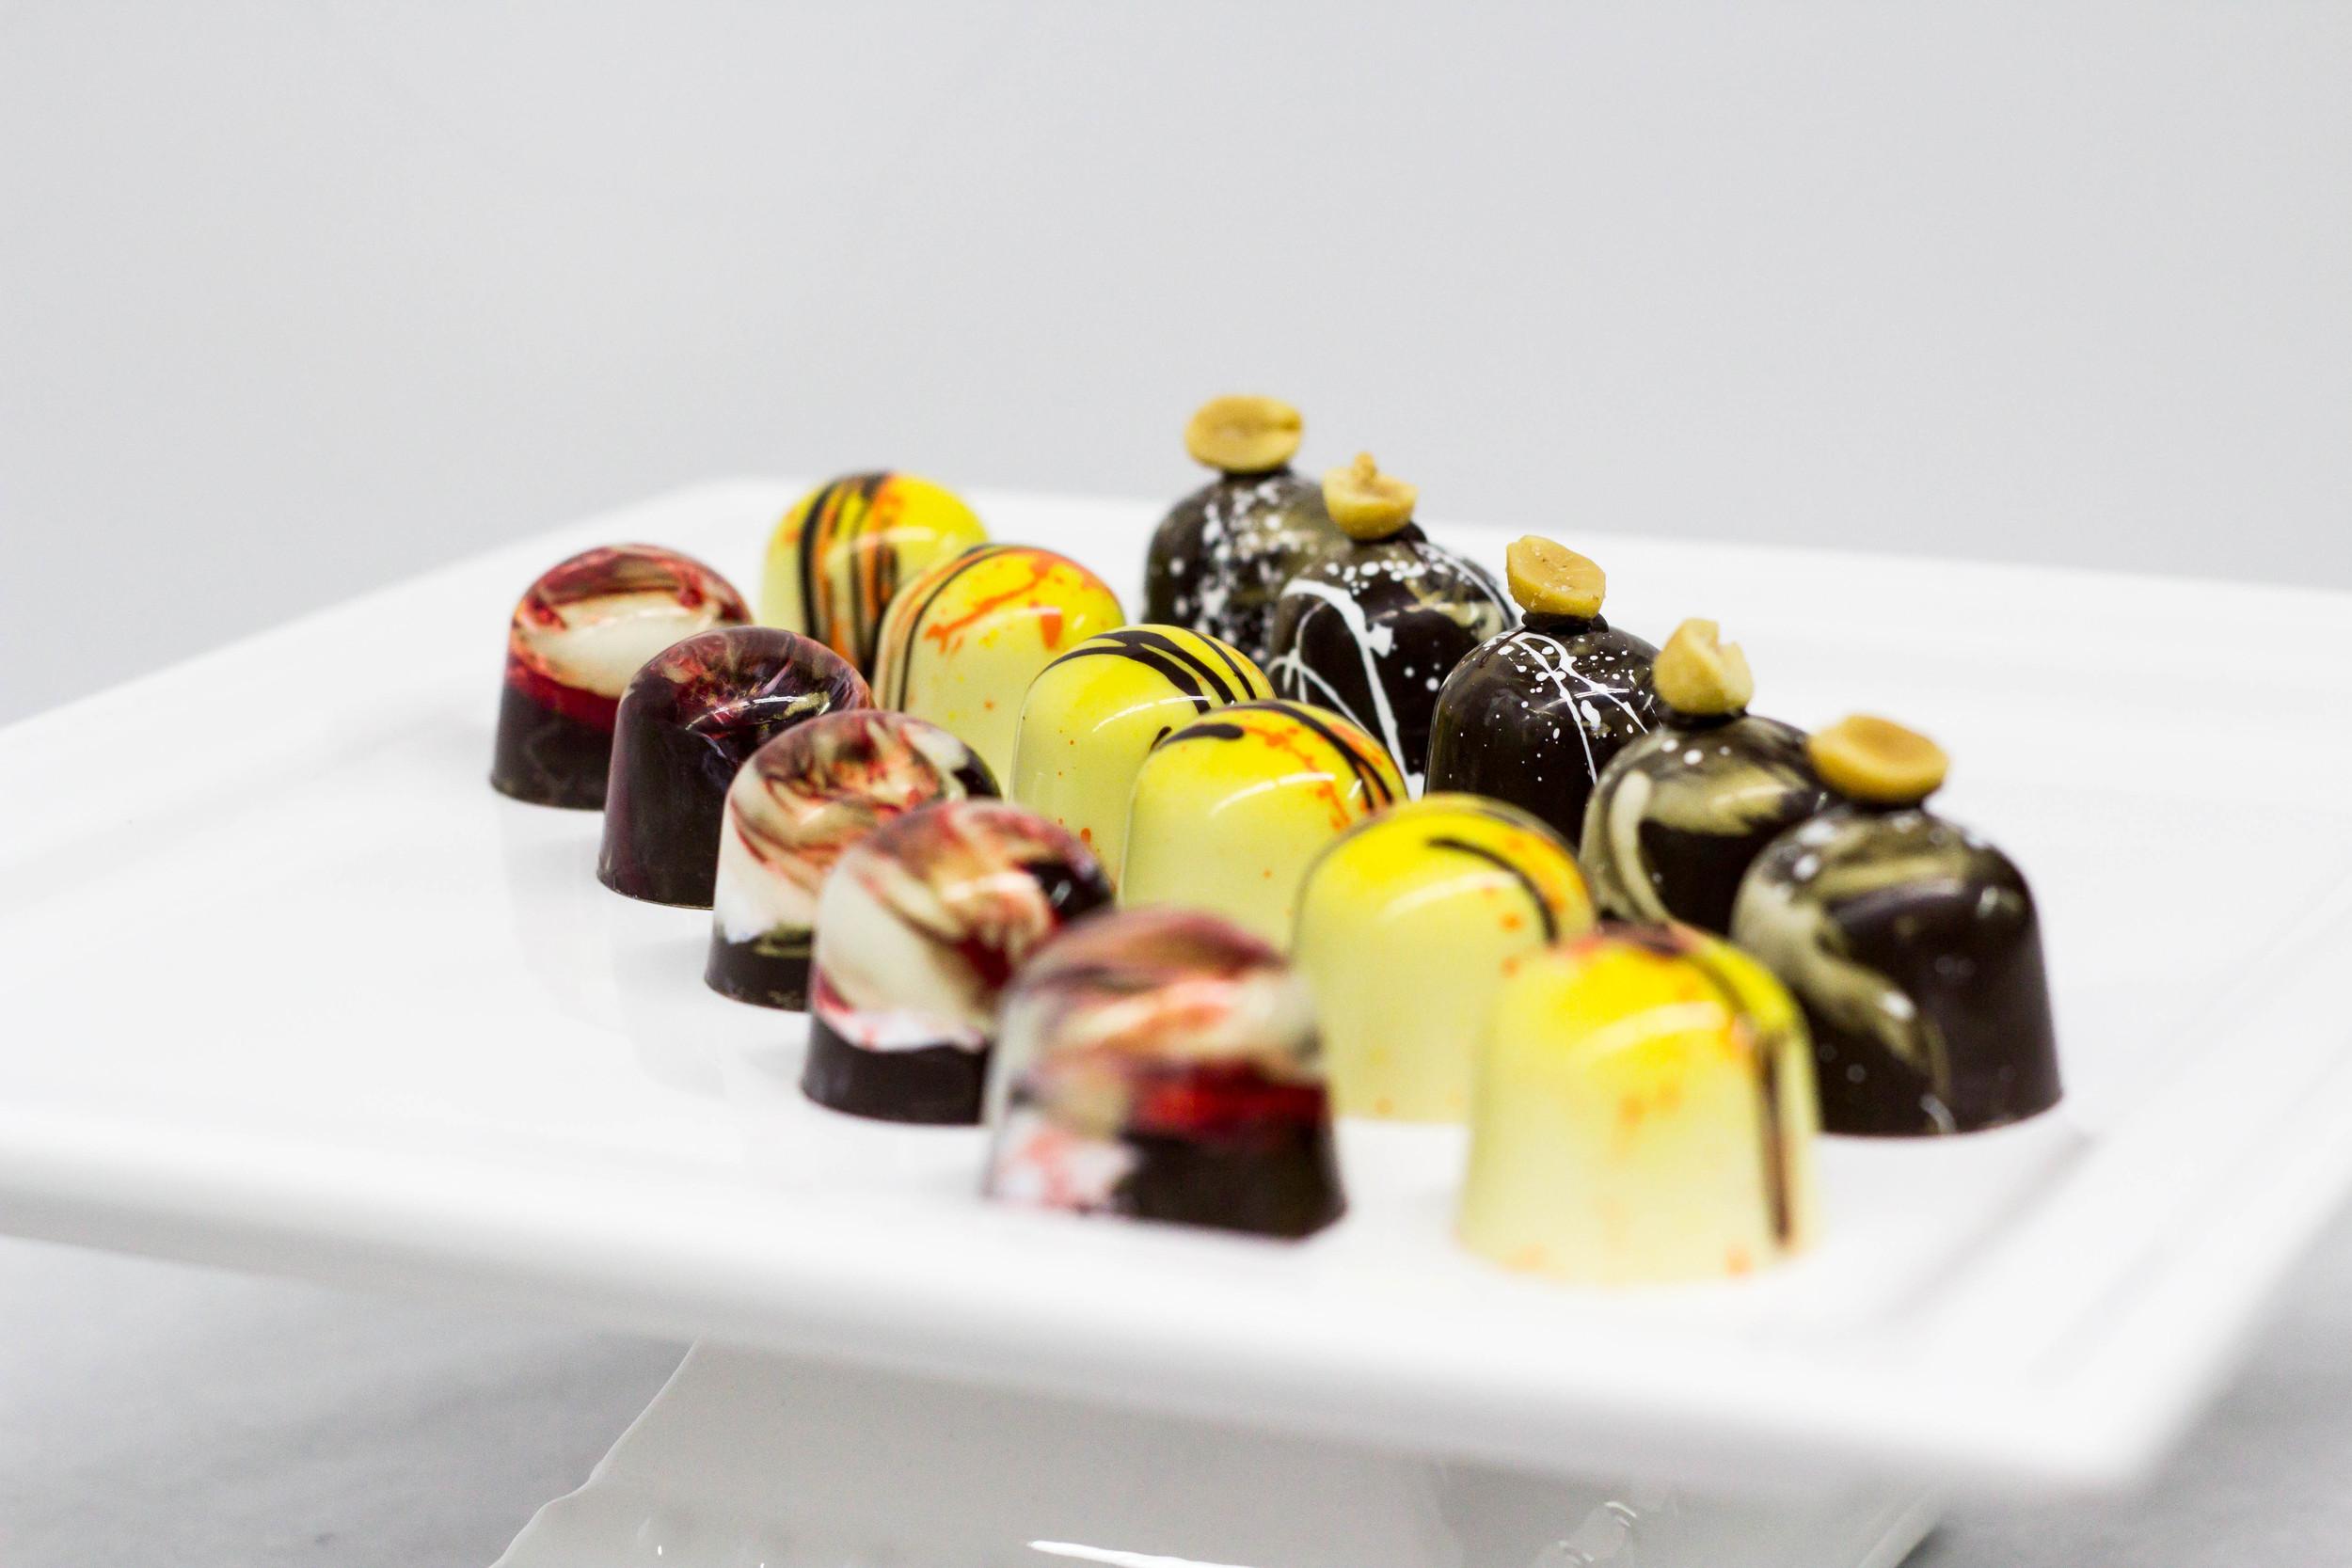 Chocolate Chocolate, Banana Curry and Peanut Butter Chocolates